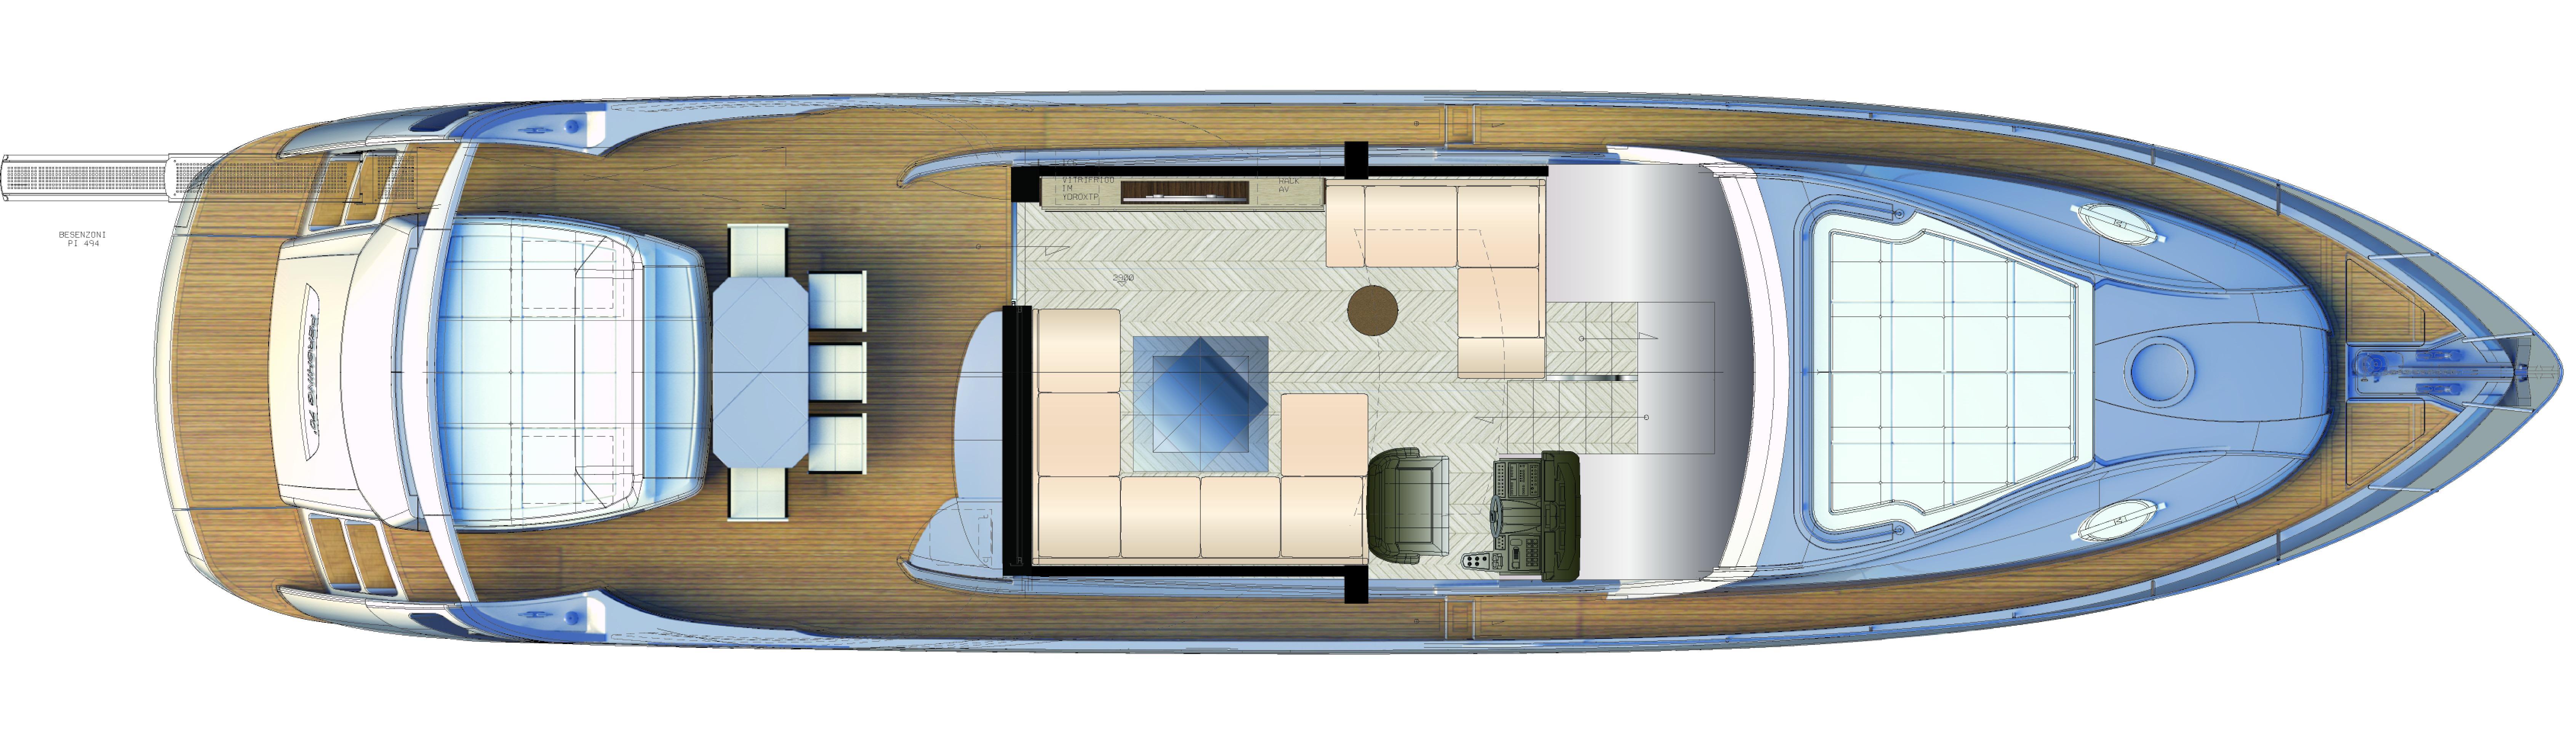 Manufacturer Provided Image: Pershing 70 Upper Deck Layout Plan